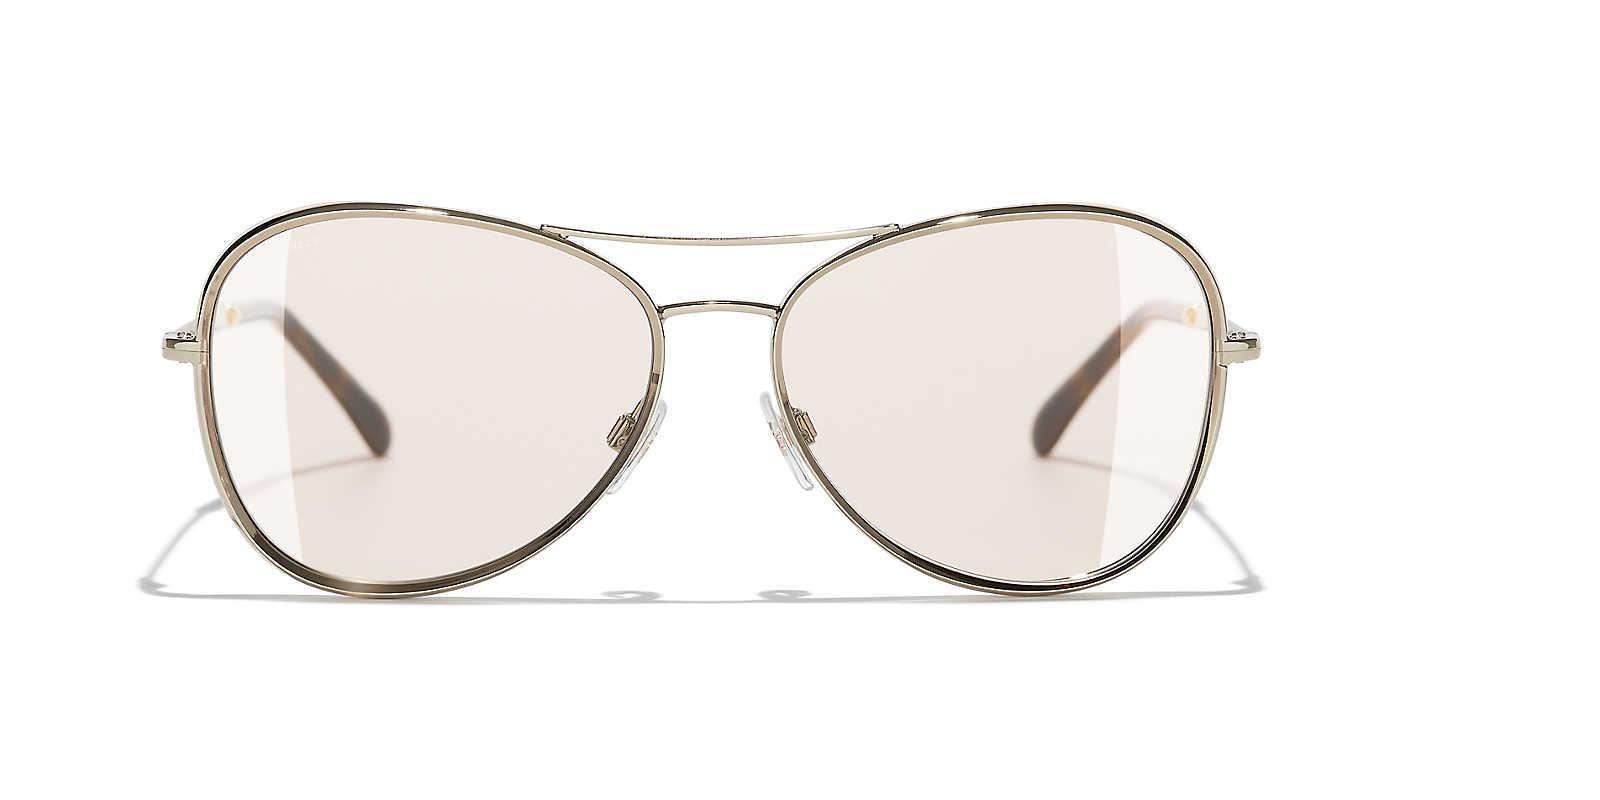 ea1f16e08d60 Chanel - Brown Sunglass Pilot Sunglasses - Lyst. View fullscreen